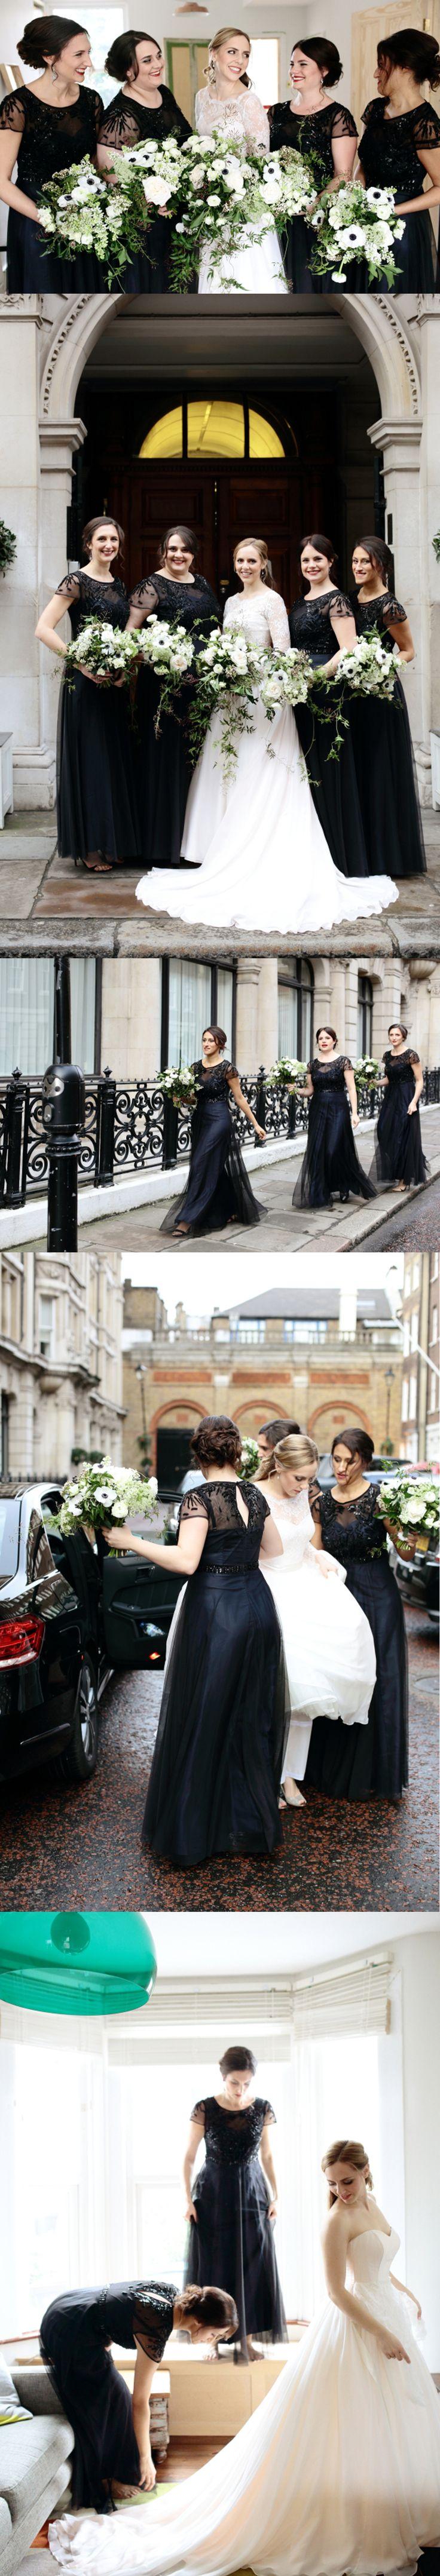 Black Short Sleeve See- through Tulle Beading Open Back Long Bridesmaid Dresses, AB1177